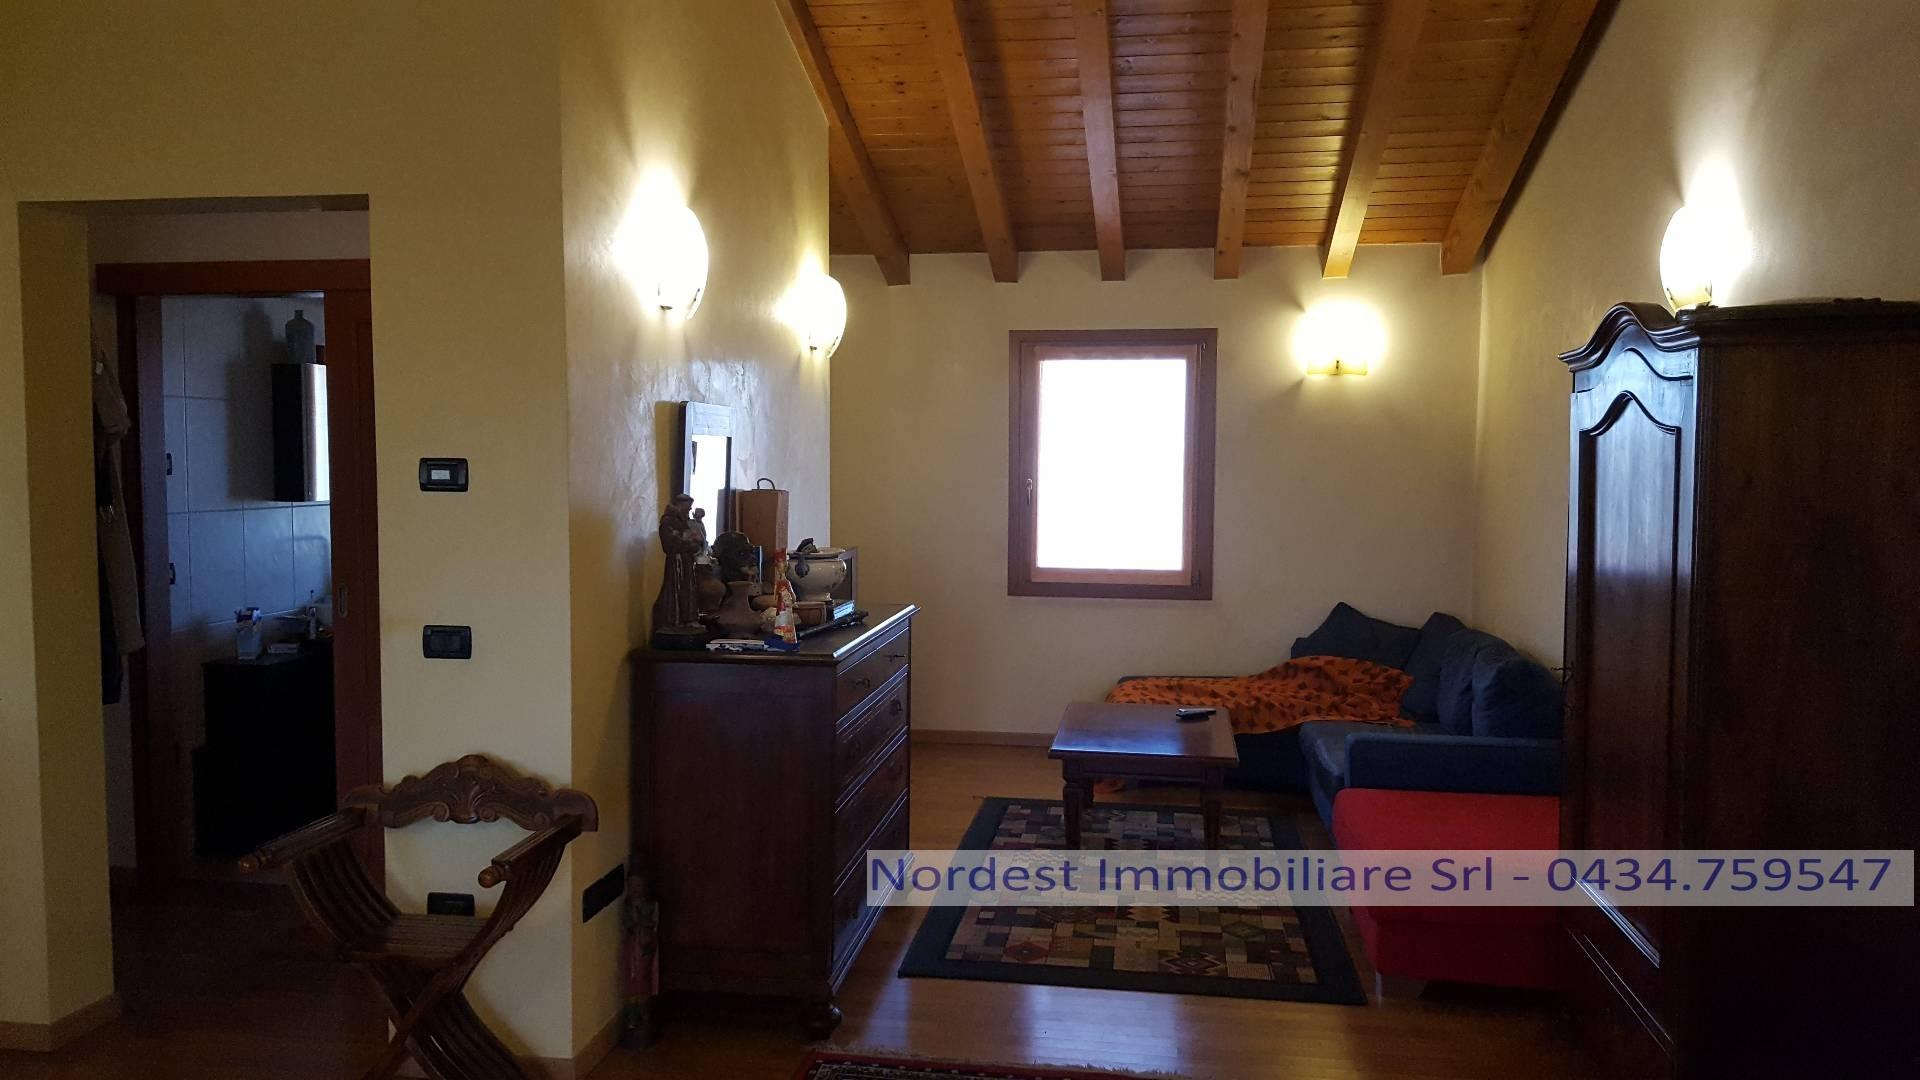 Appartamento in vendita a Brugnera, 3 locali, Trattative riservate | PortaleAgenzieImmobiliari.it